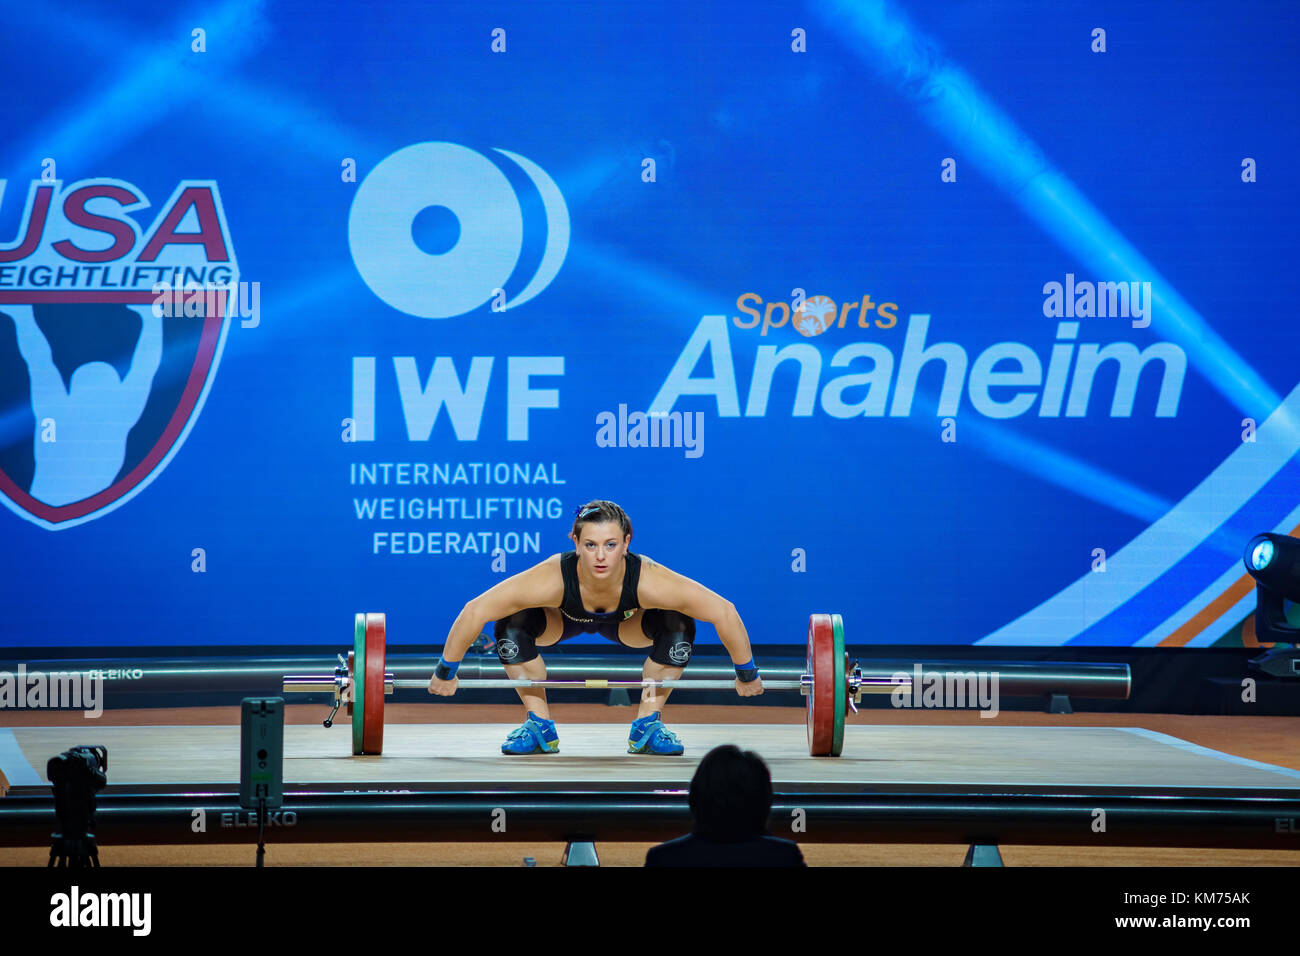 Anaheim, NOV 30: 2017 Bordignon Giorgia International Weightlifting Federation World Championships on NOV 30, 2017 - Stock Image